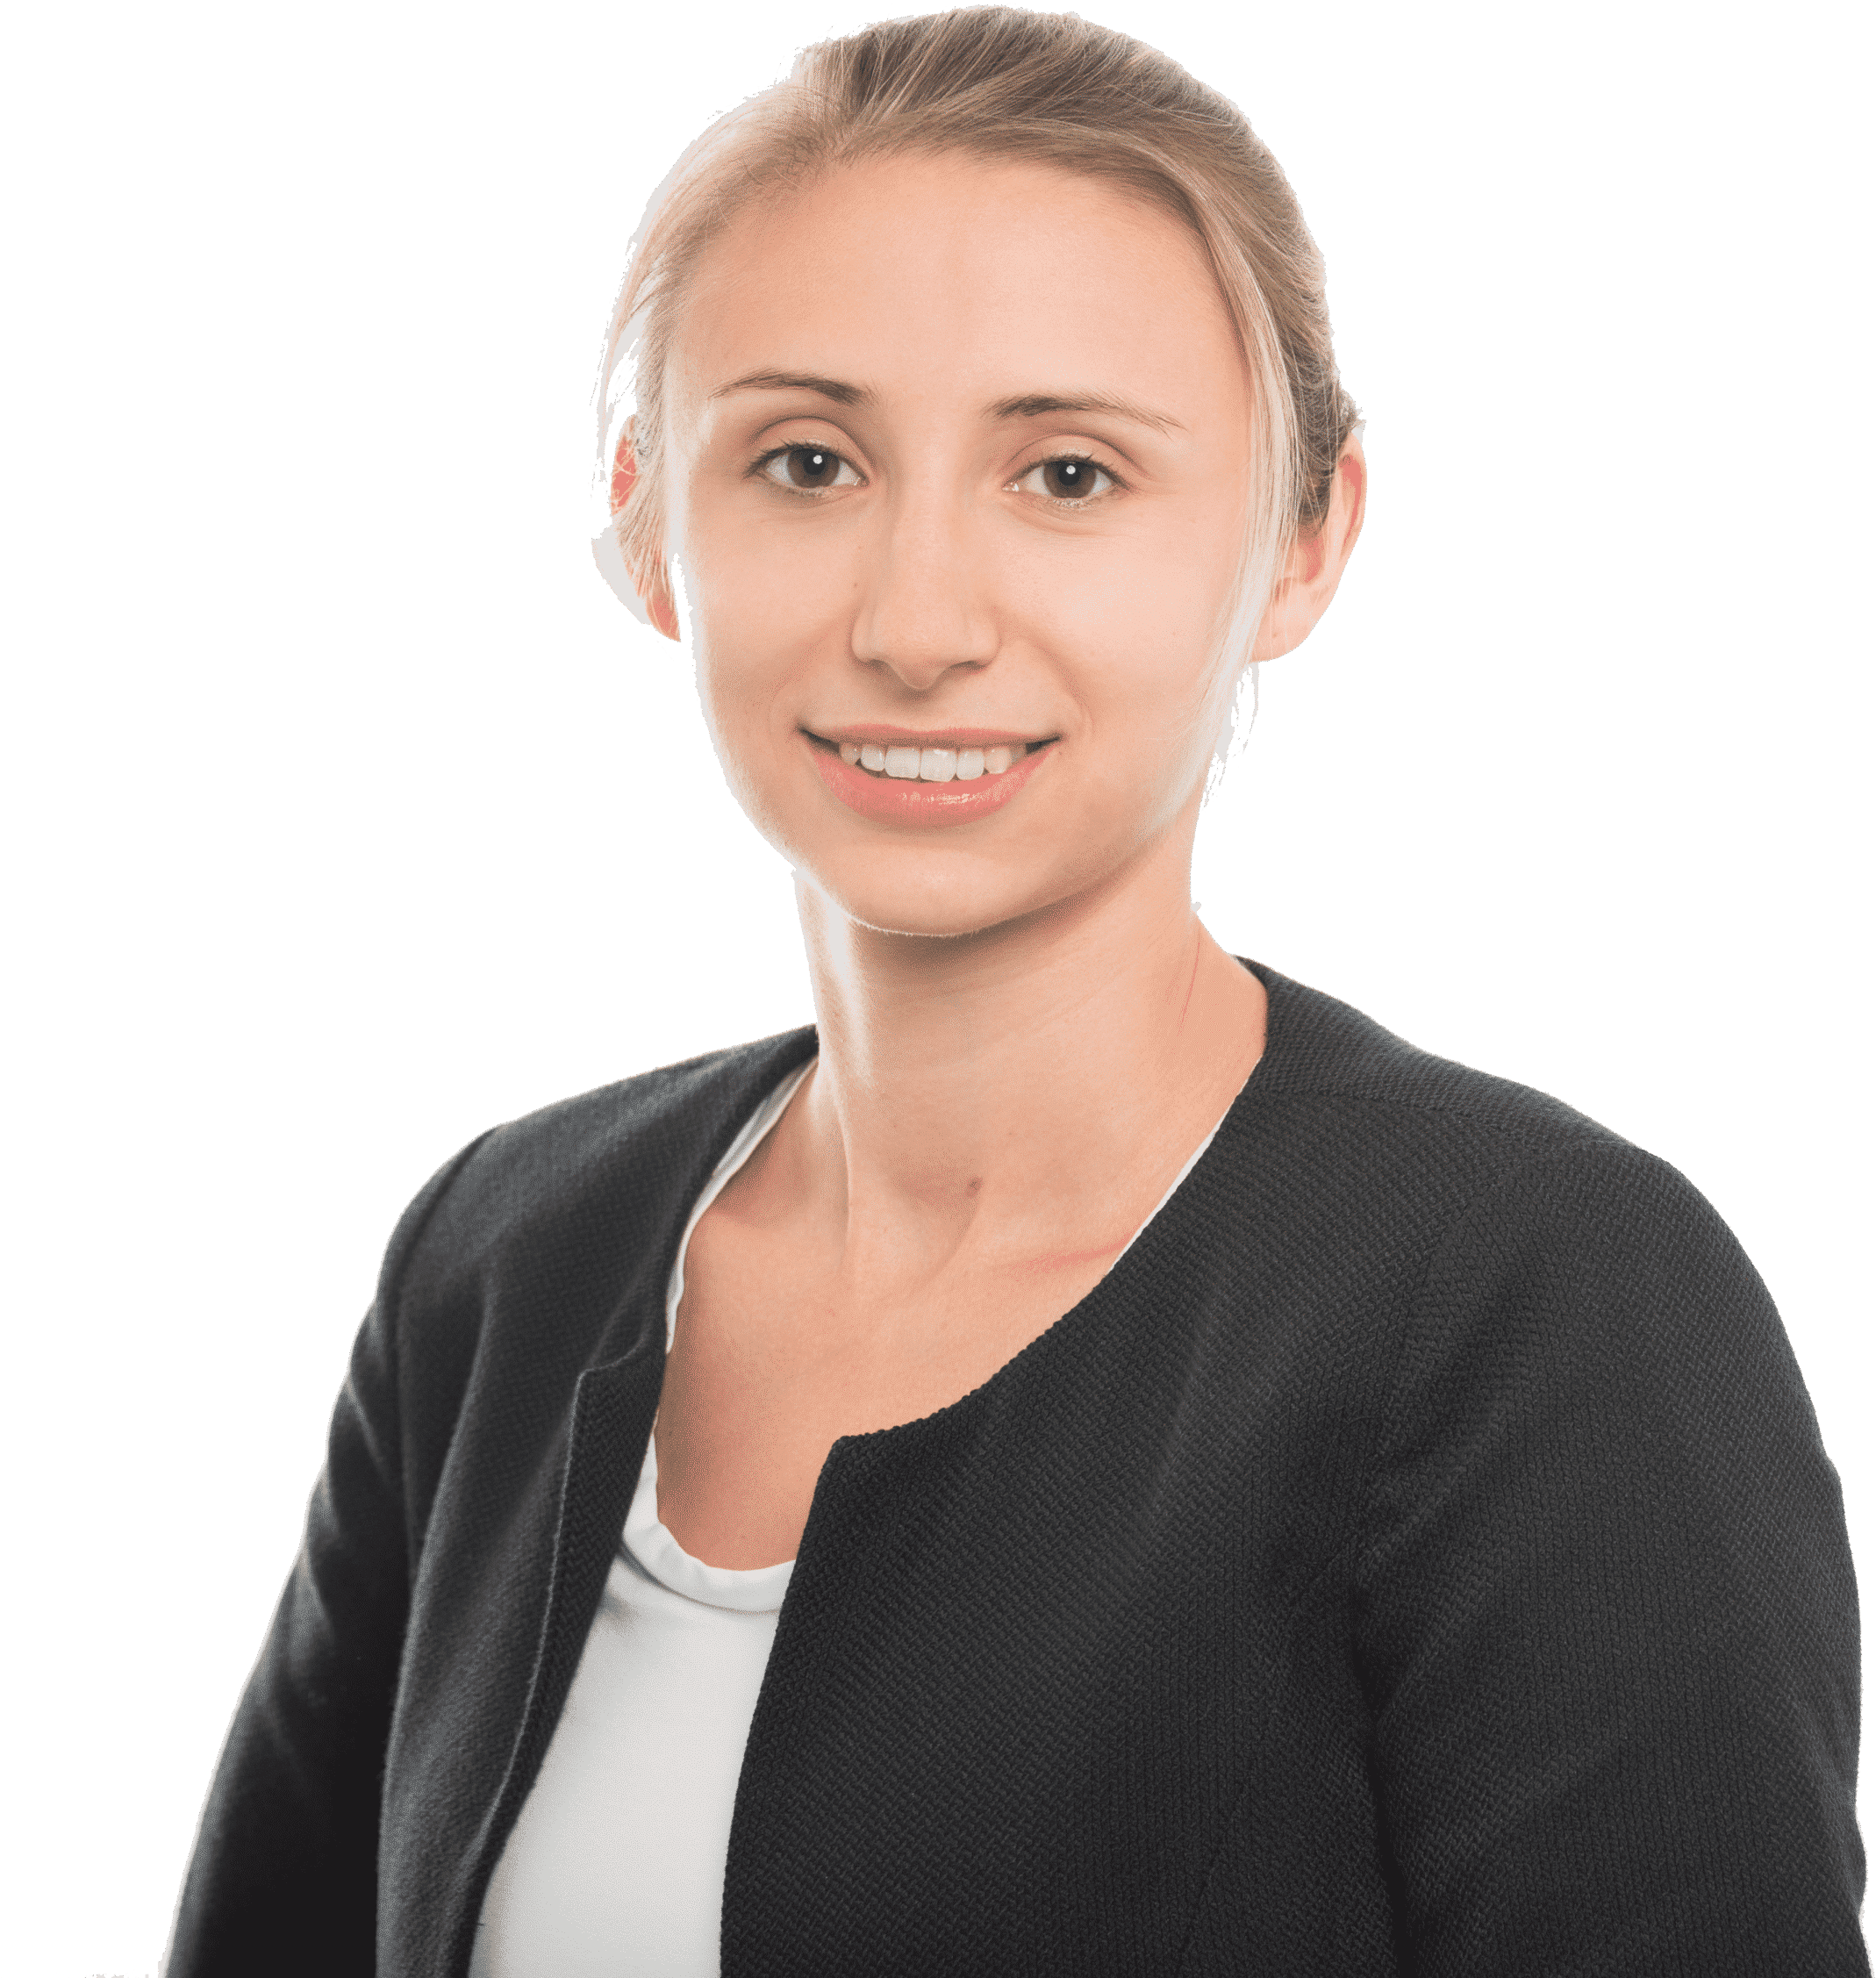 Mitarbeiterin excent Carla Roth